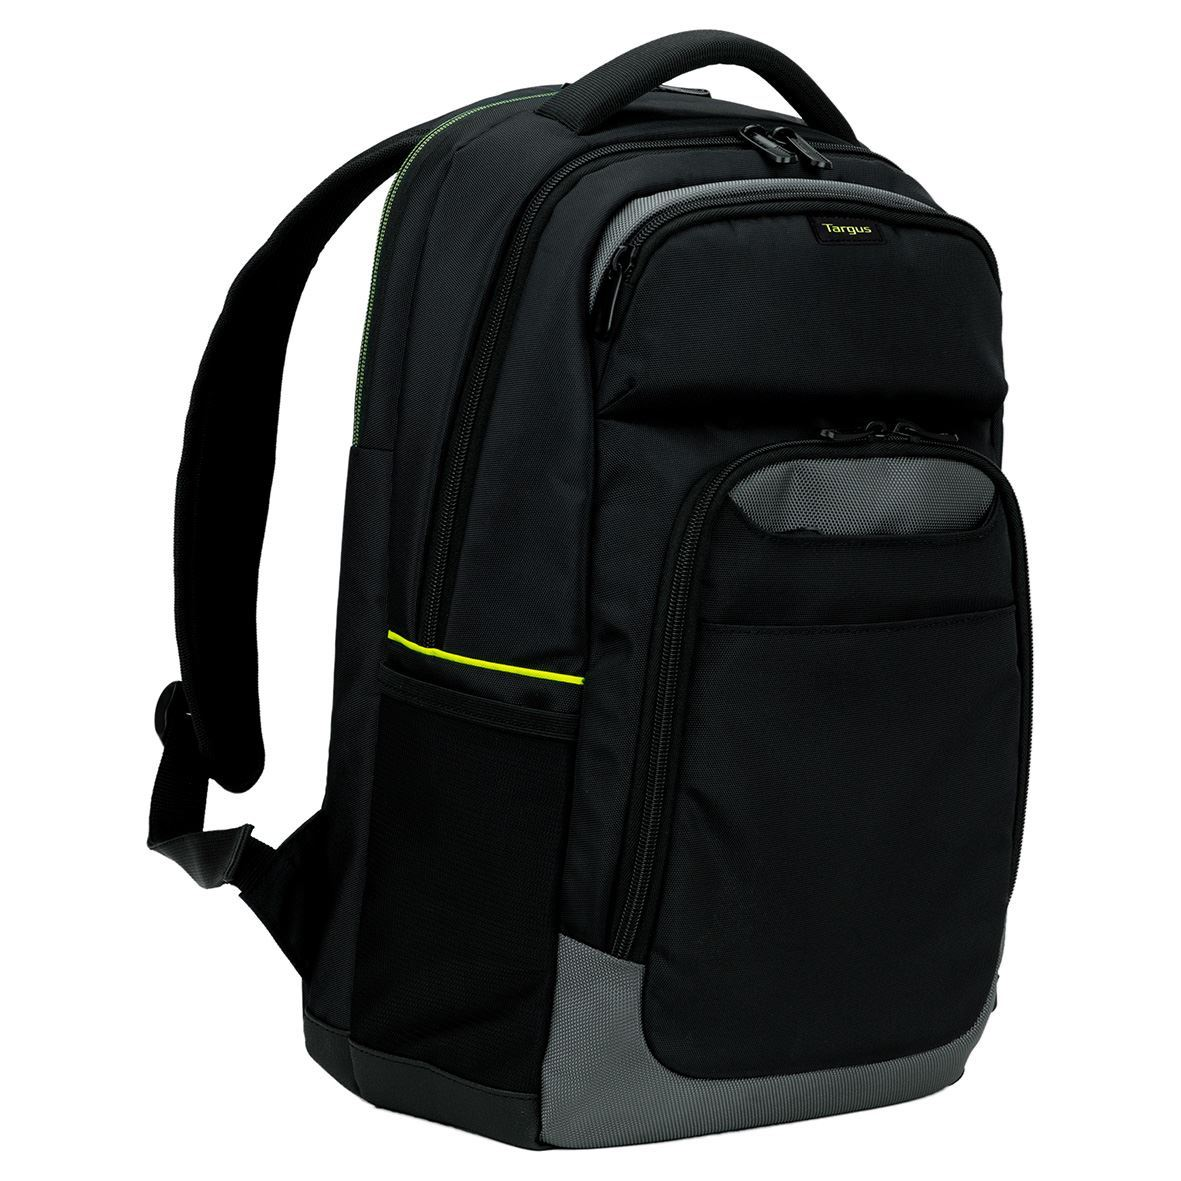 Rucsac Notebook Targus CityGear TCG660 15.6 inch Black